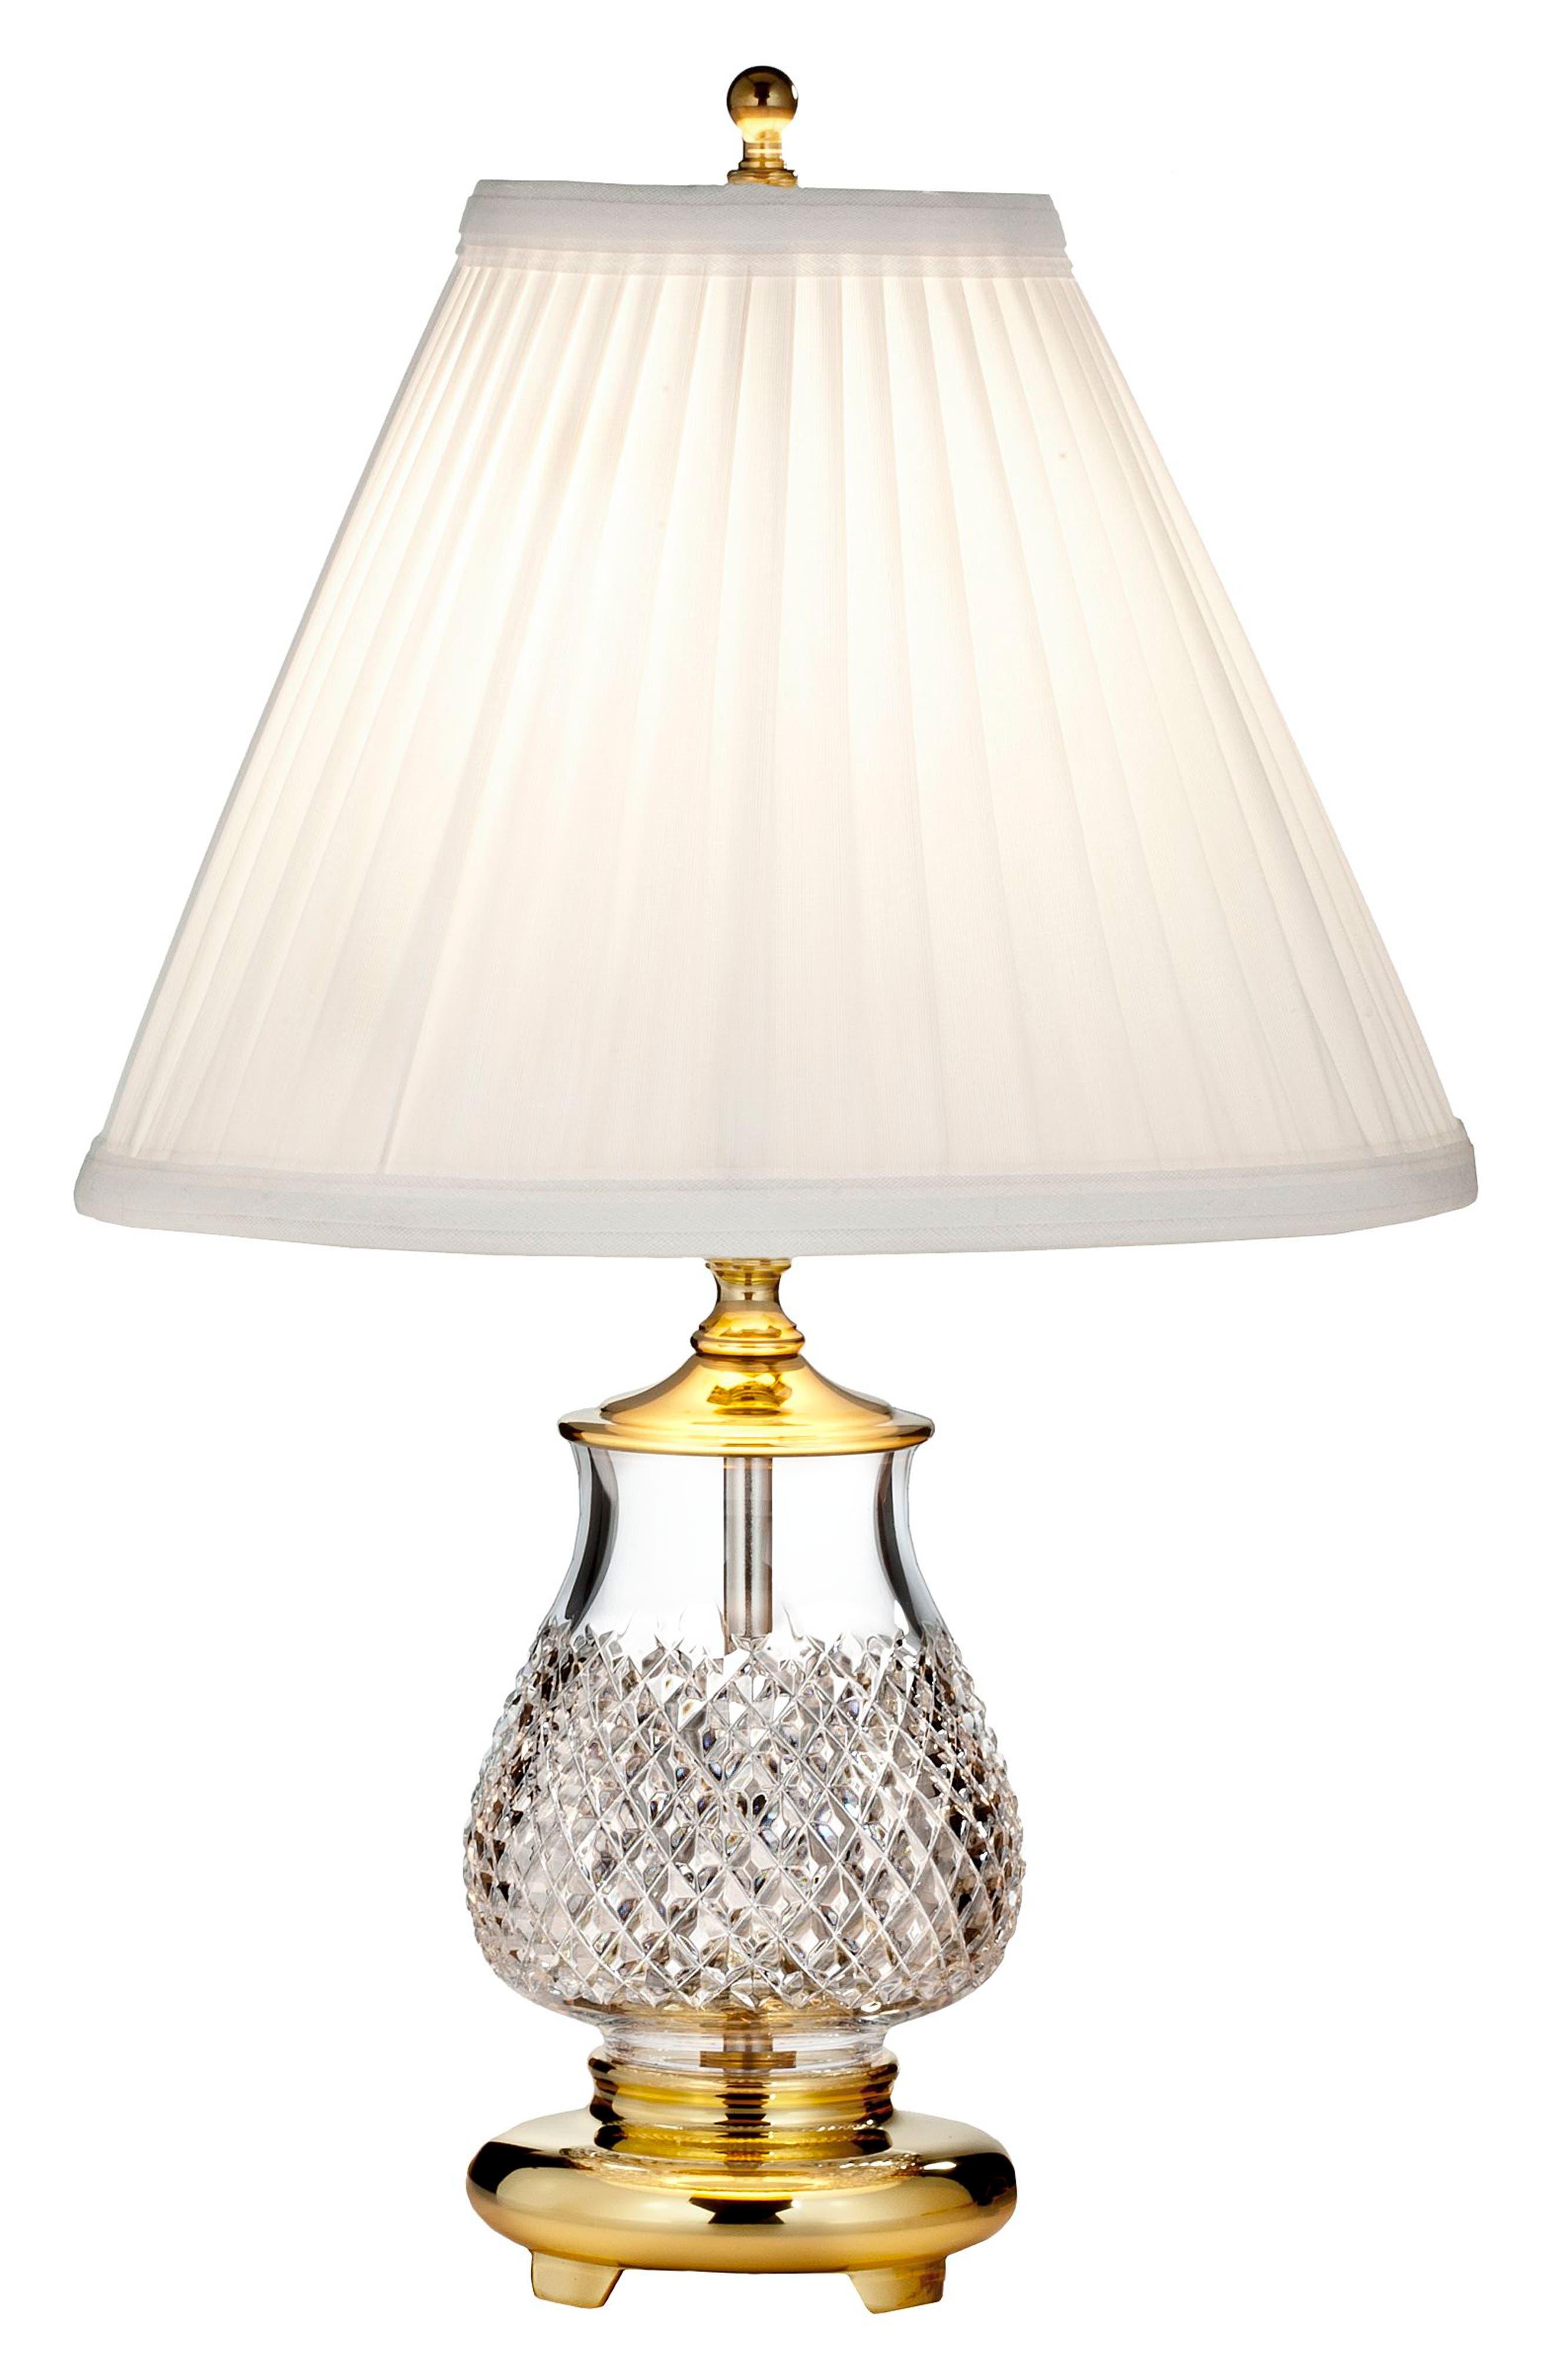 Main Image - Waterford Alana Crystal Table Lamp